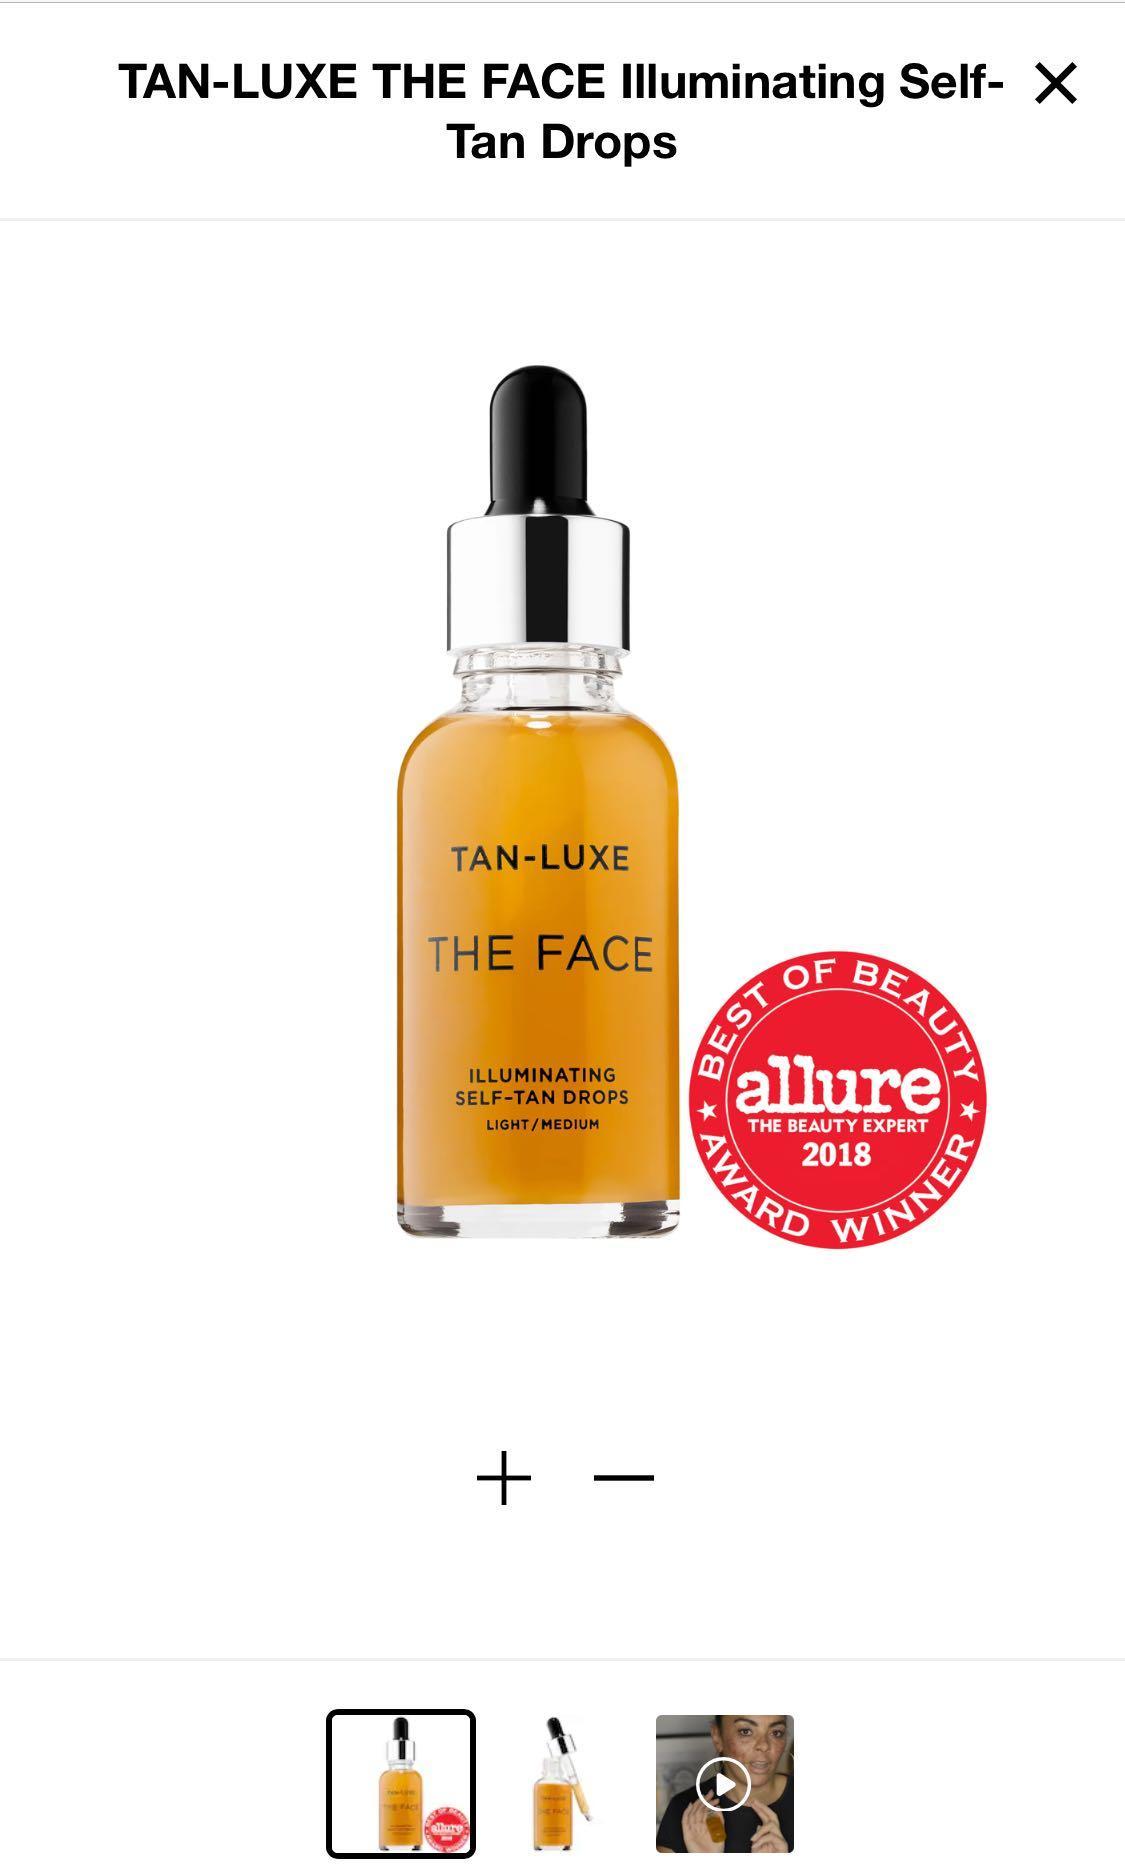 Tan lux self tanning drops - light/medium shade